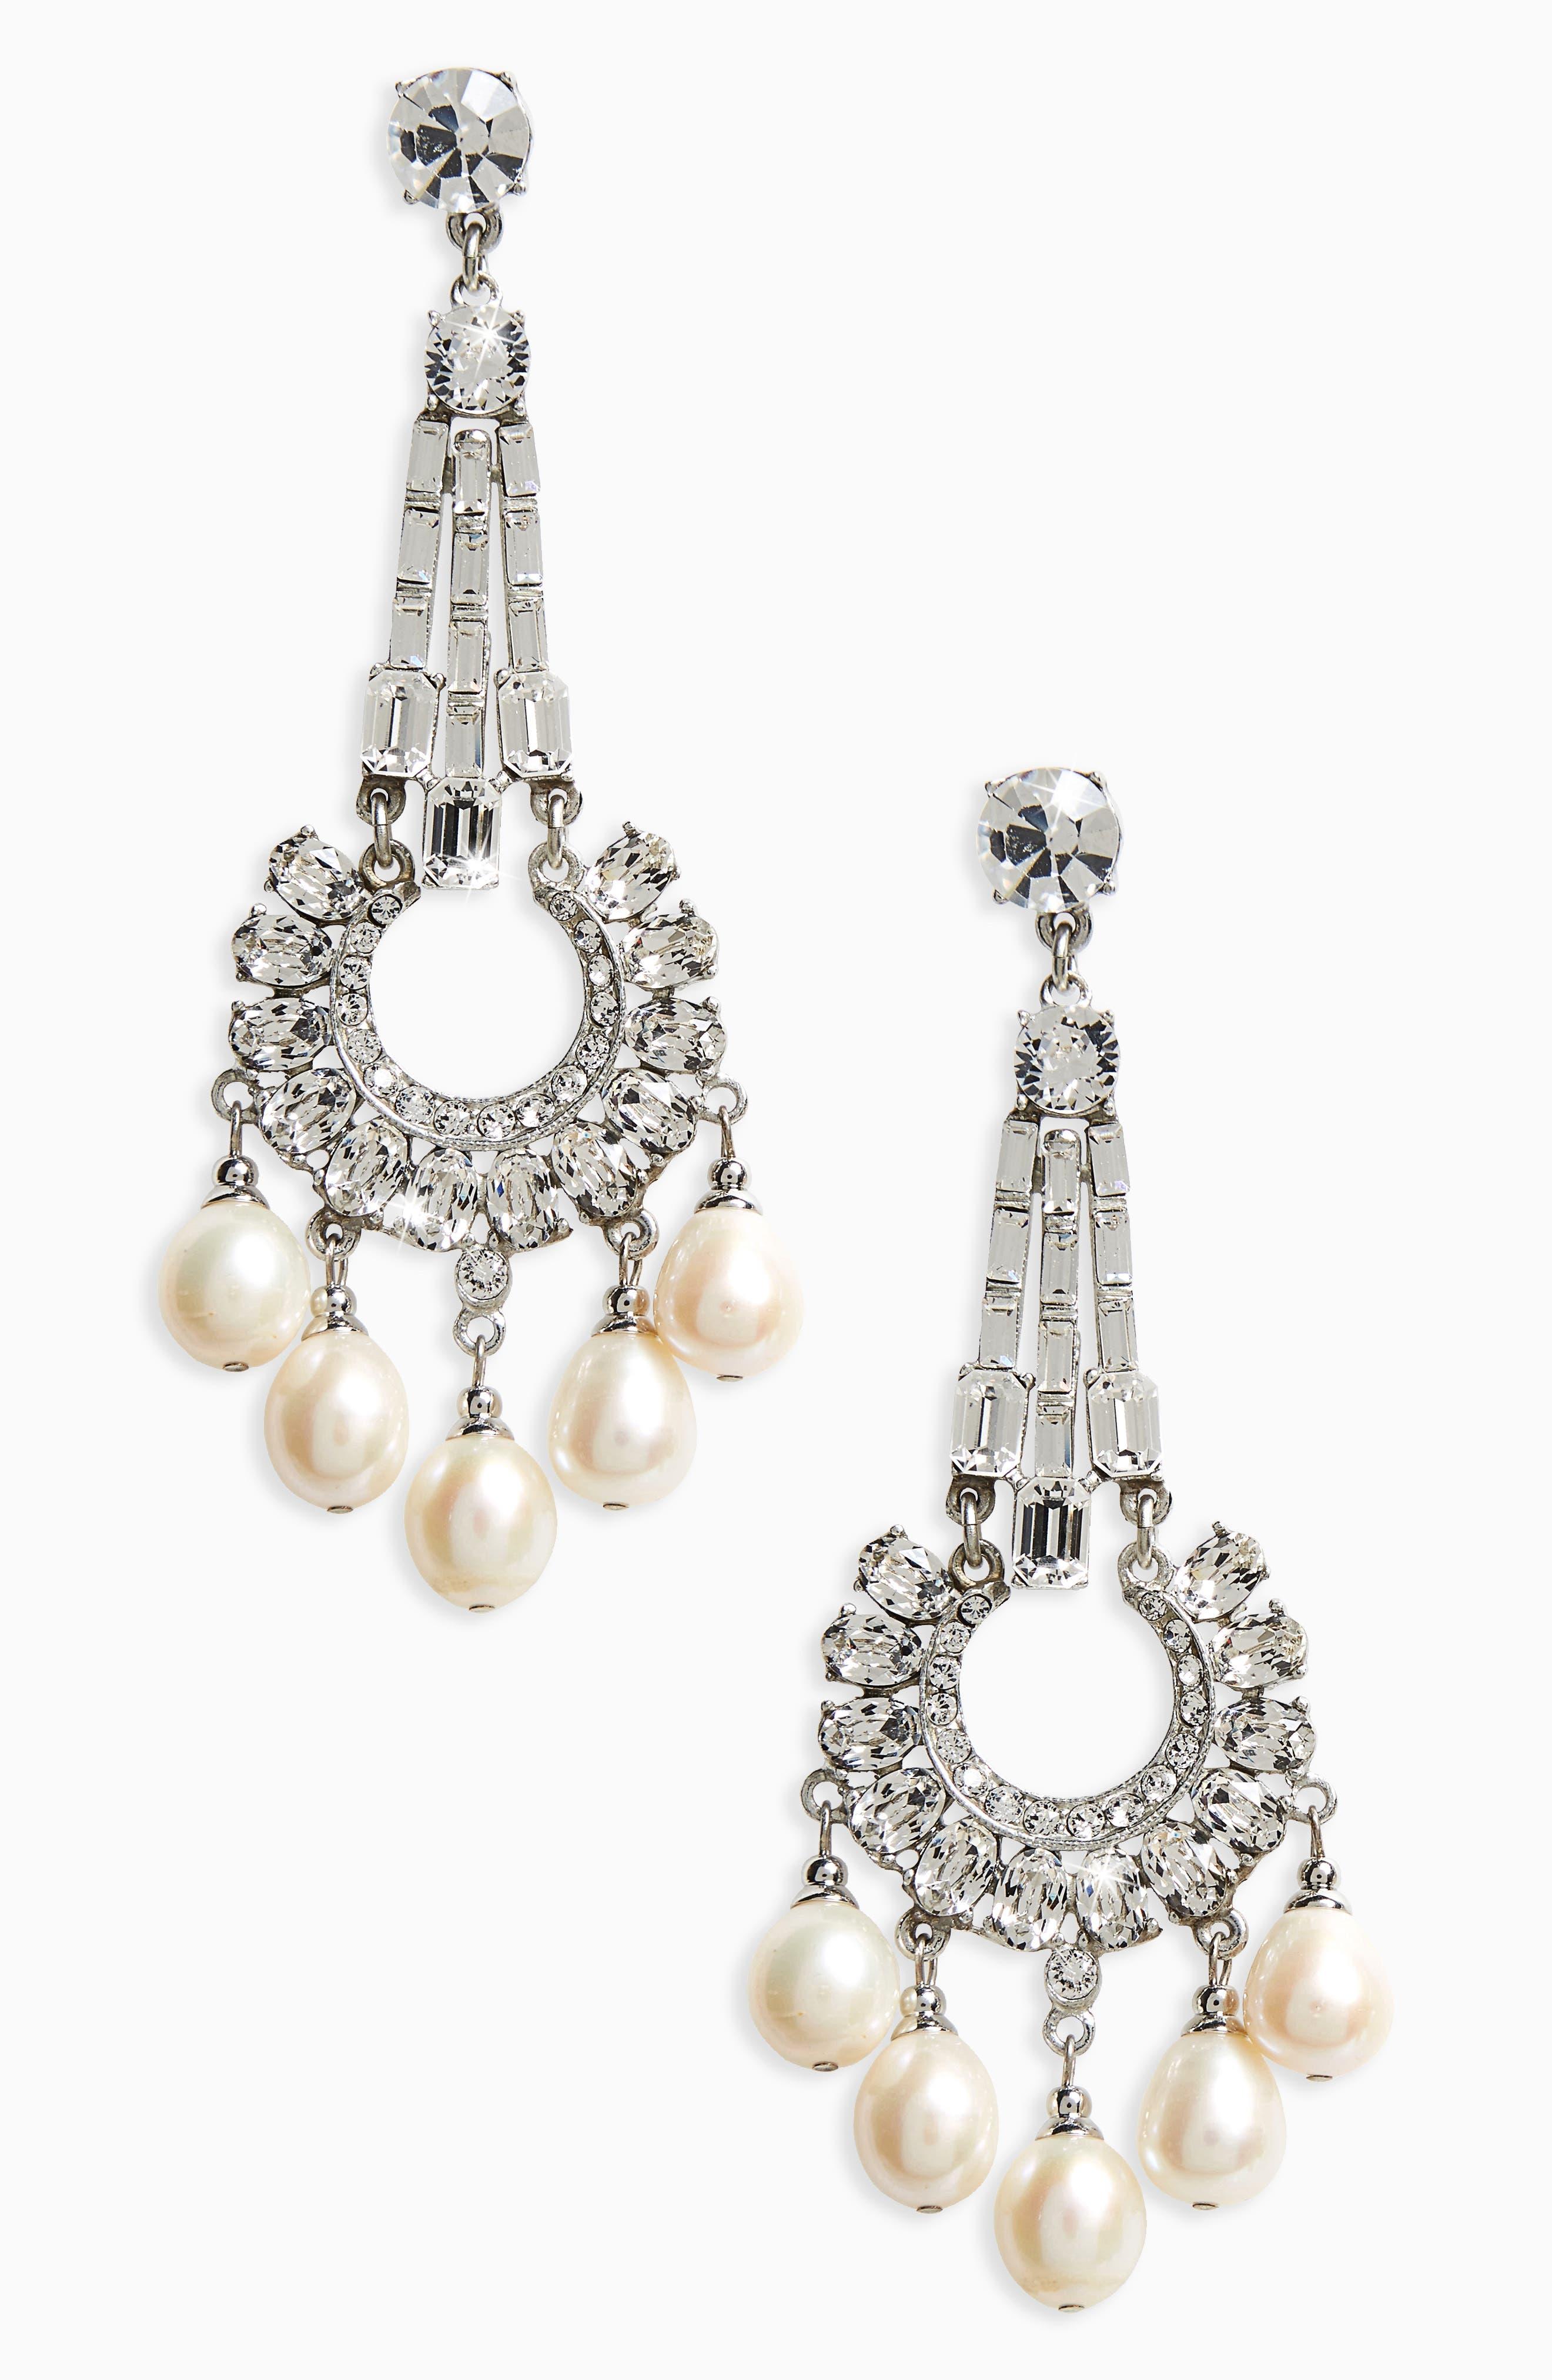 Imitation Pearl & Crystal Drop Earrings,                             Main thumbnail 1, color,                             Ivory / Silver